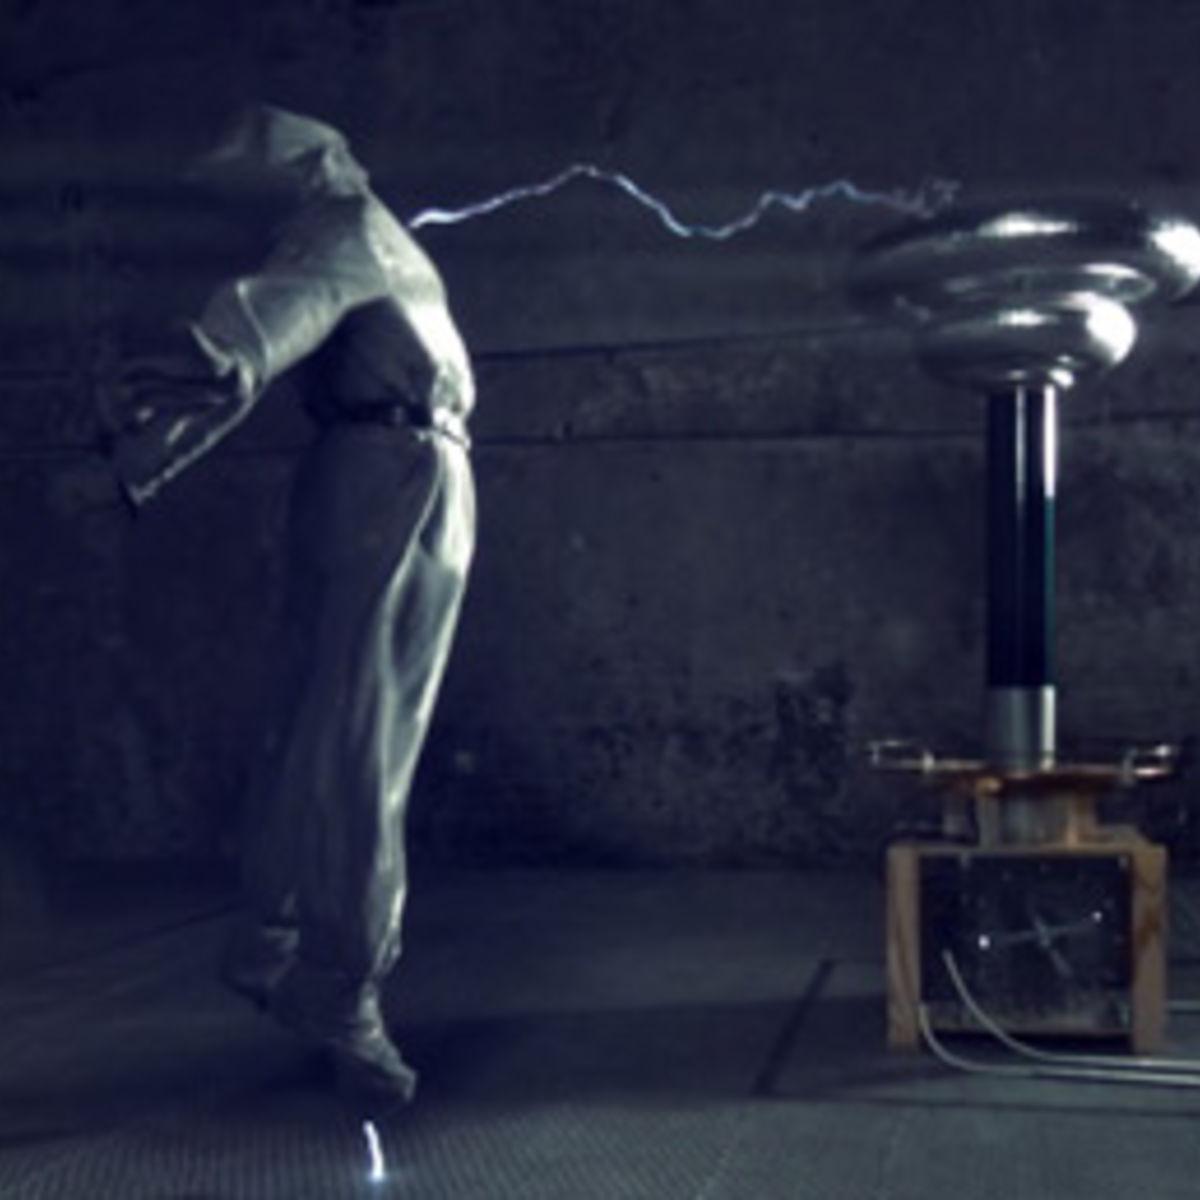 cymatics_354_1.jpg